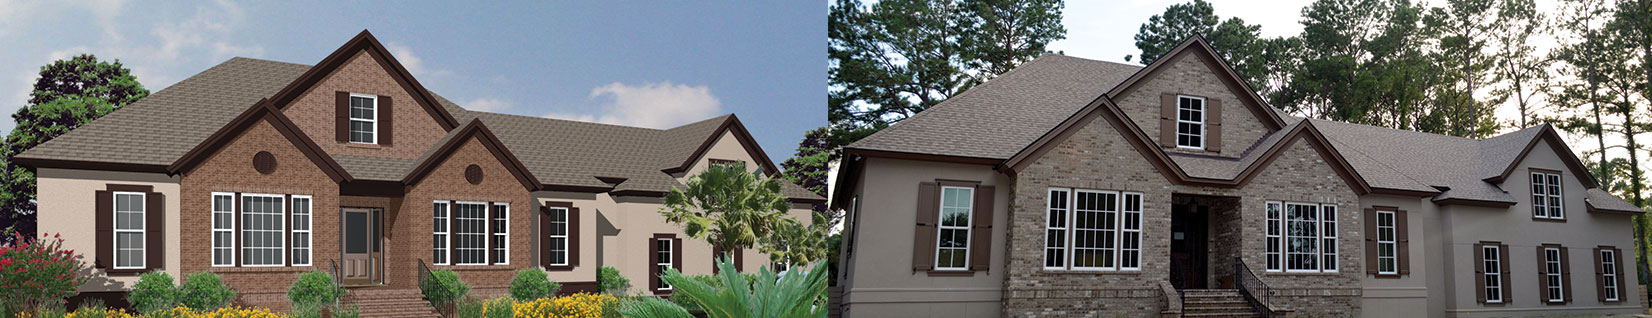 Energy Efficient Homes Insulsteel Of South Carolina Llc